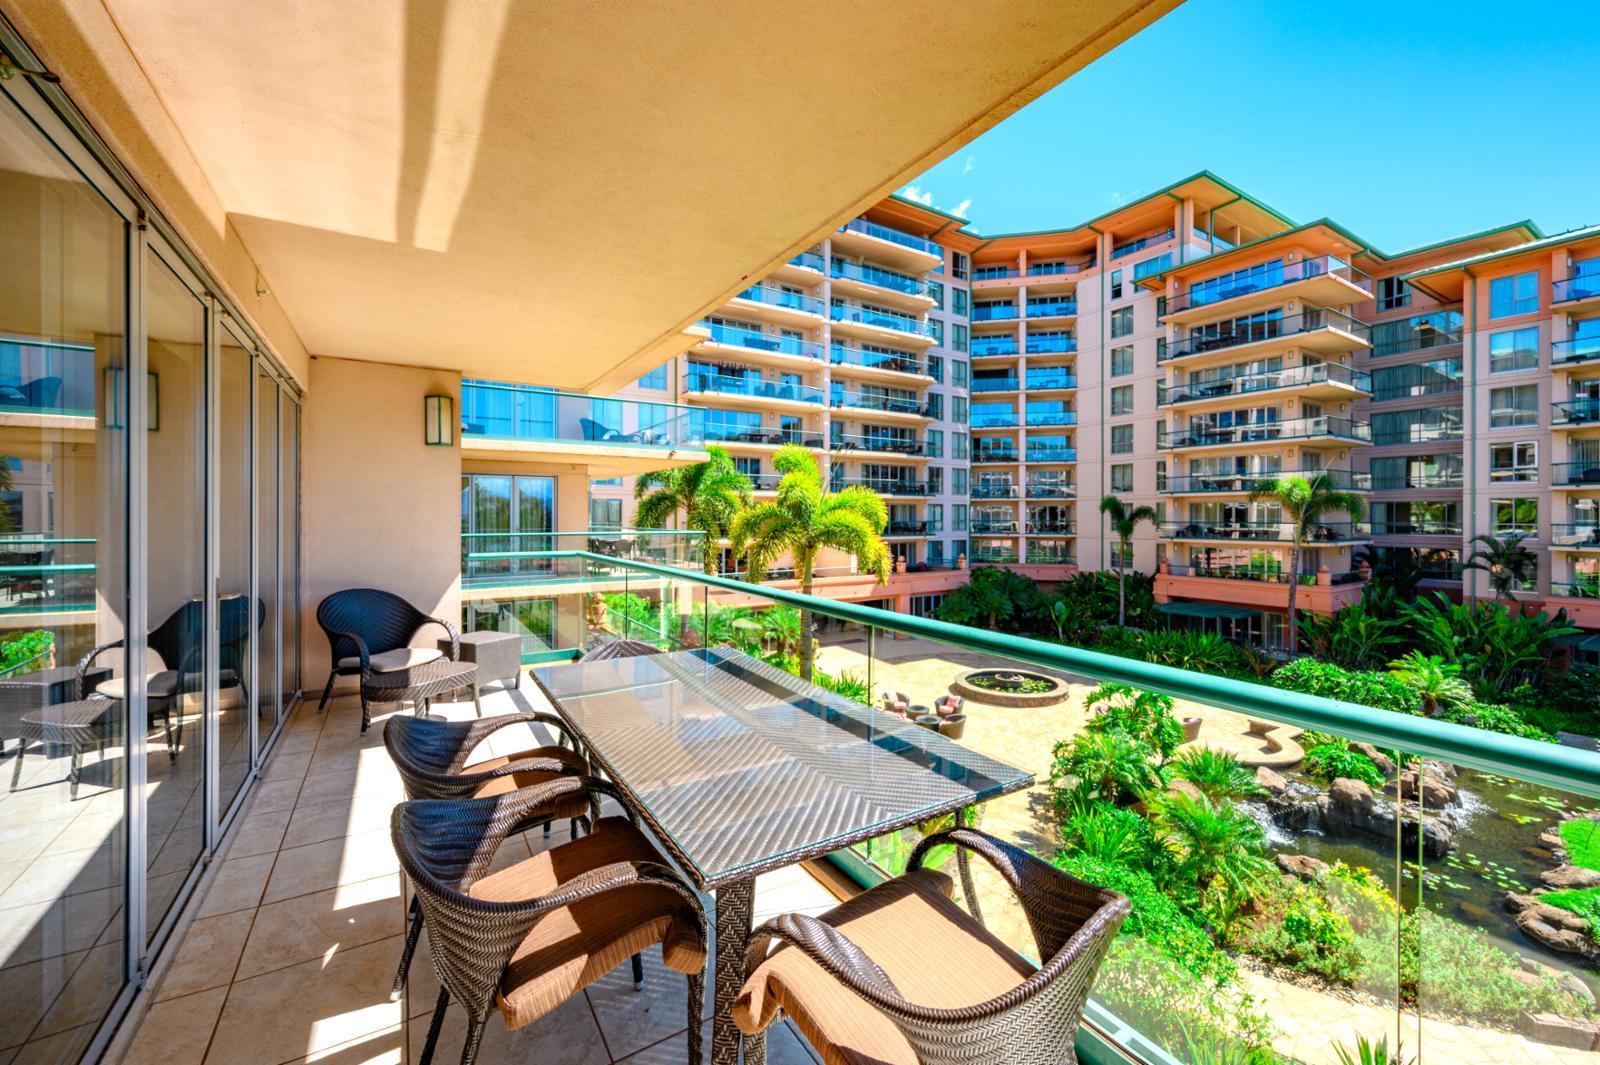 Lanai and Resort View